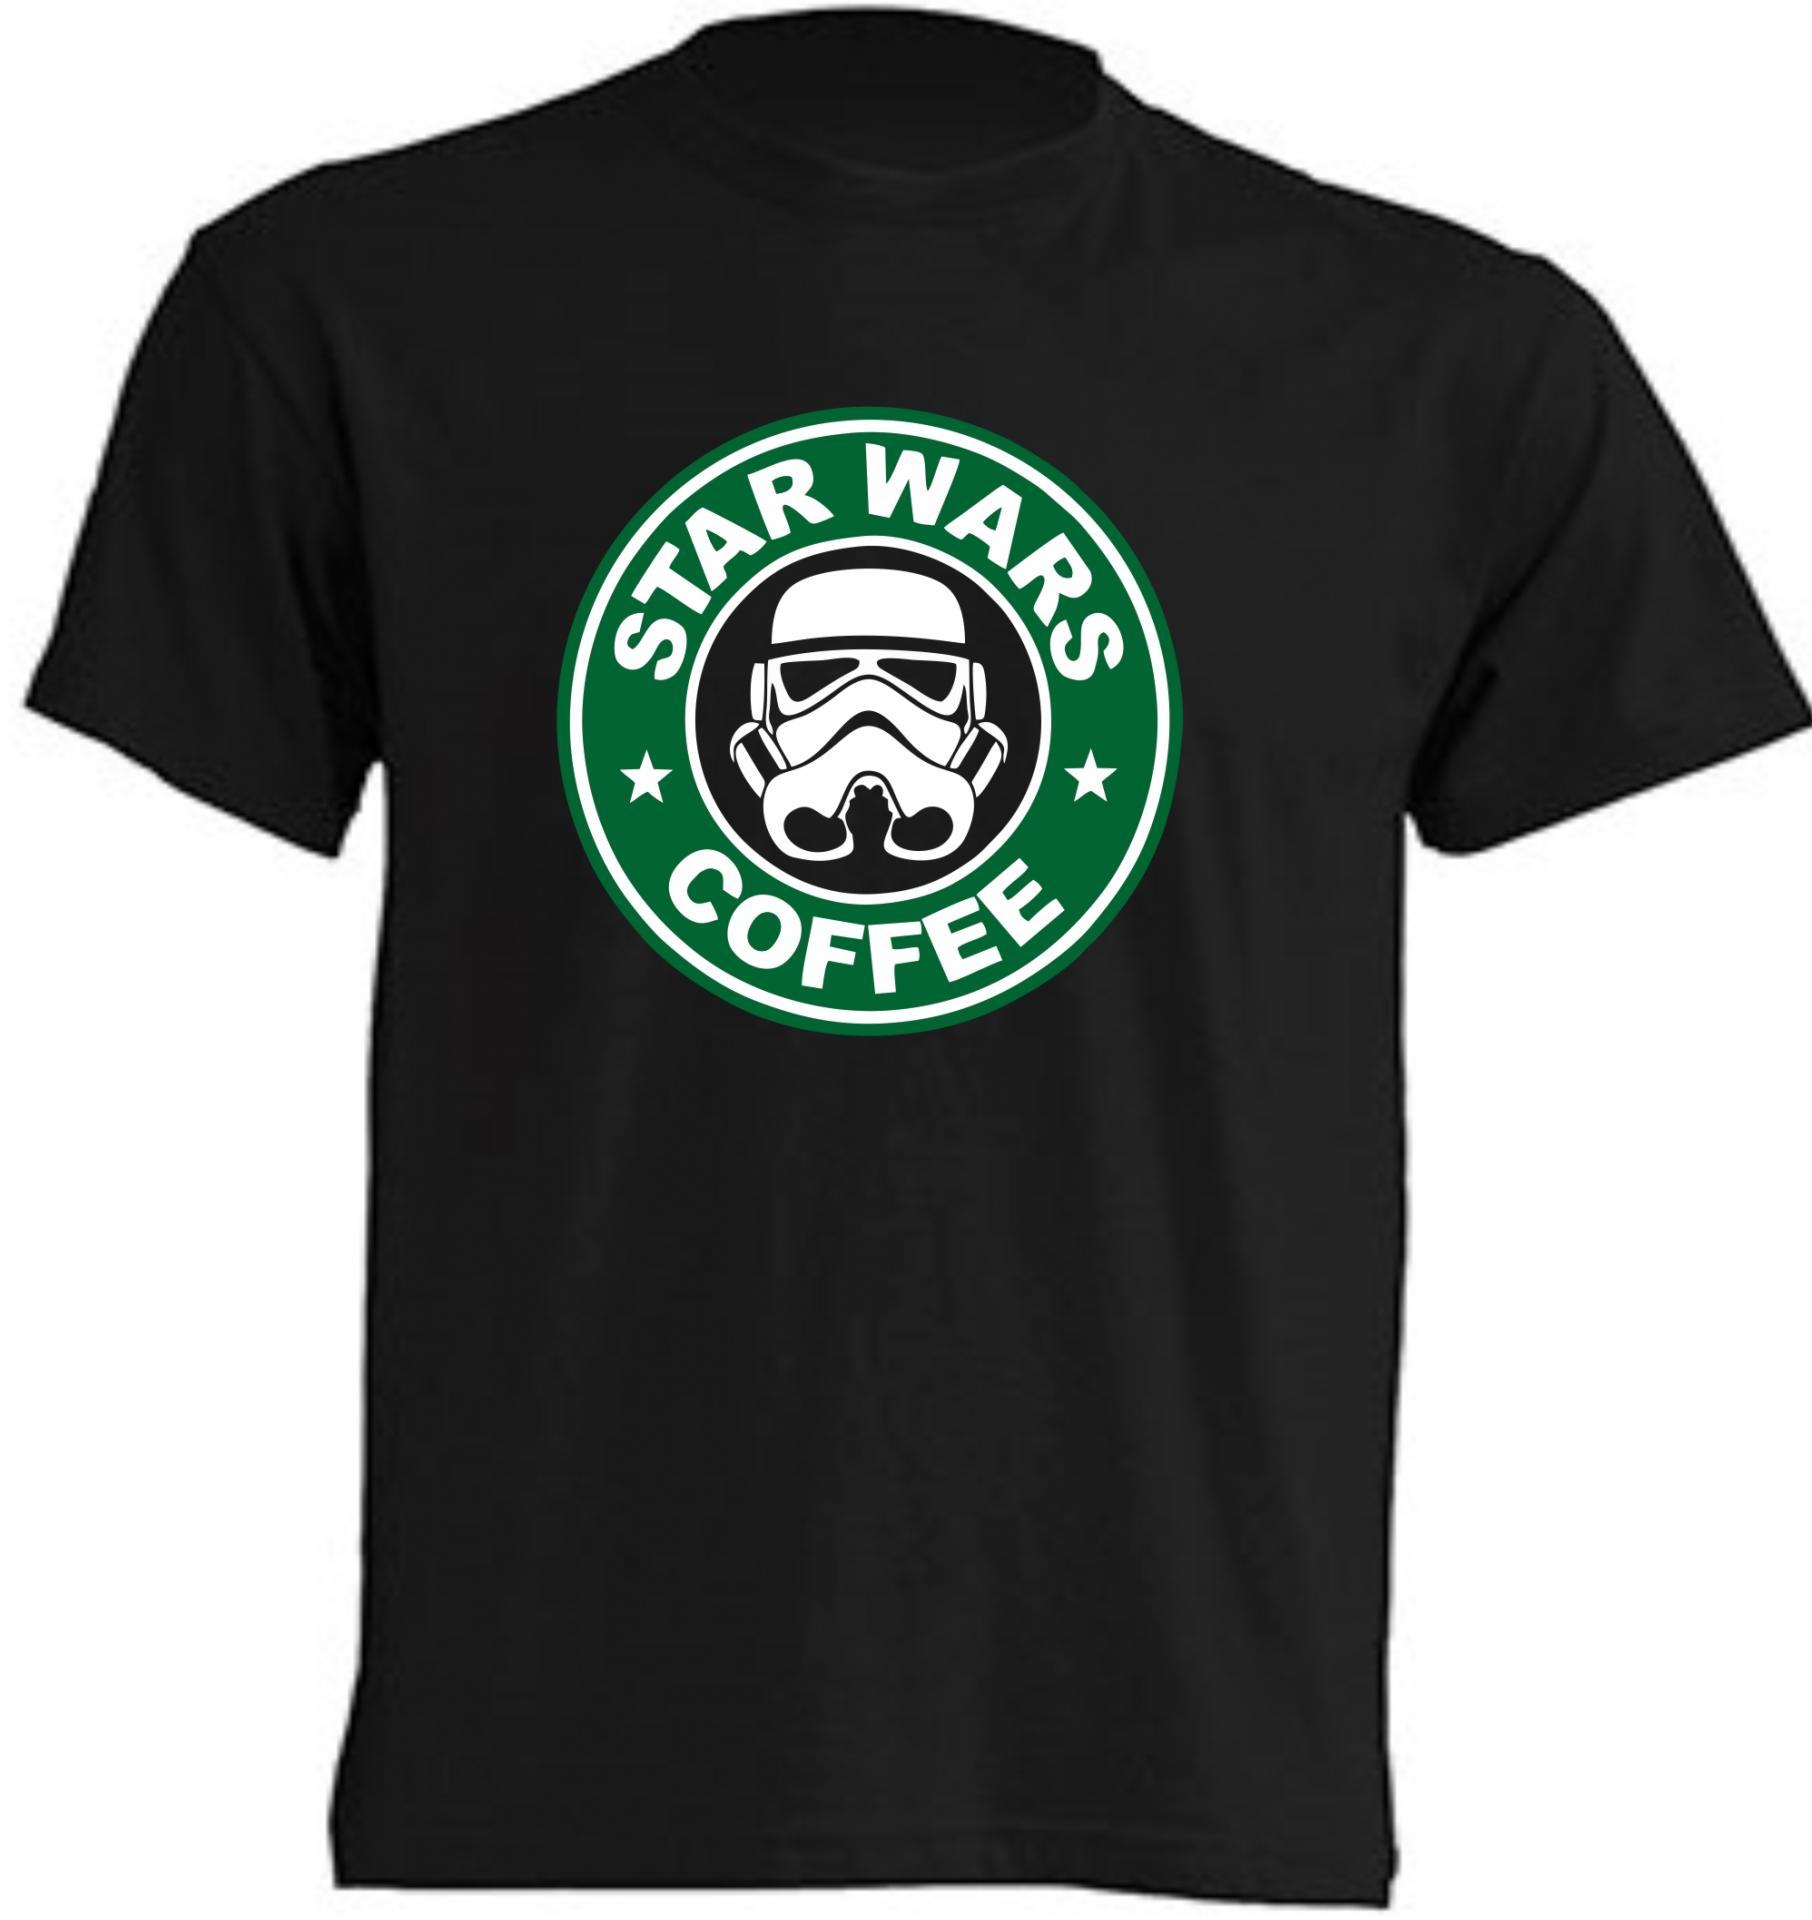 CAMISETA STARWARS COFFEE